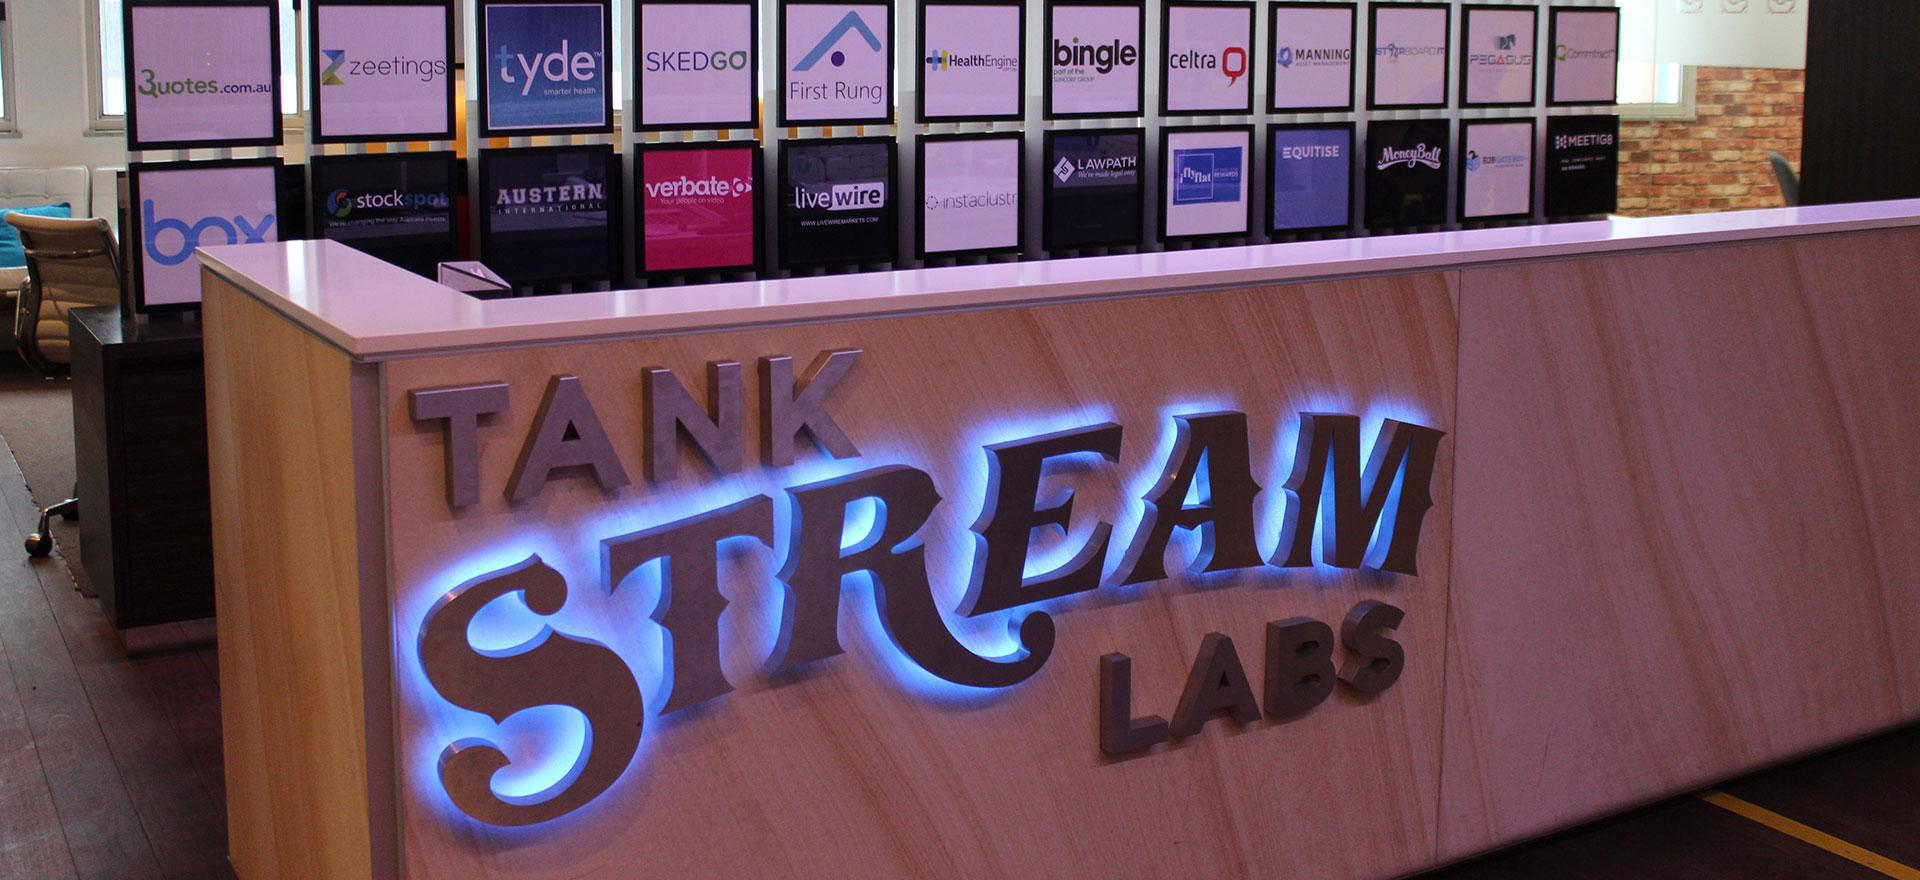 Tank Stream Labs, Sydney